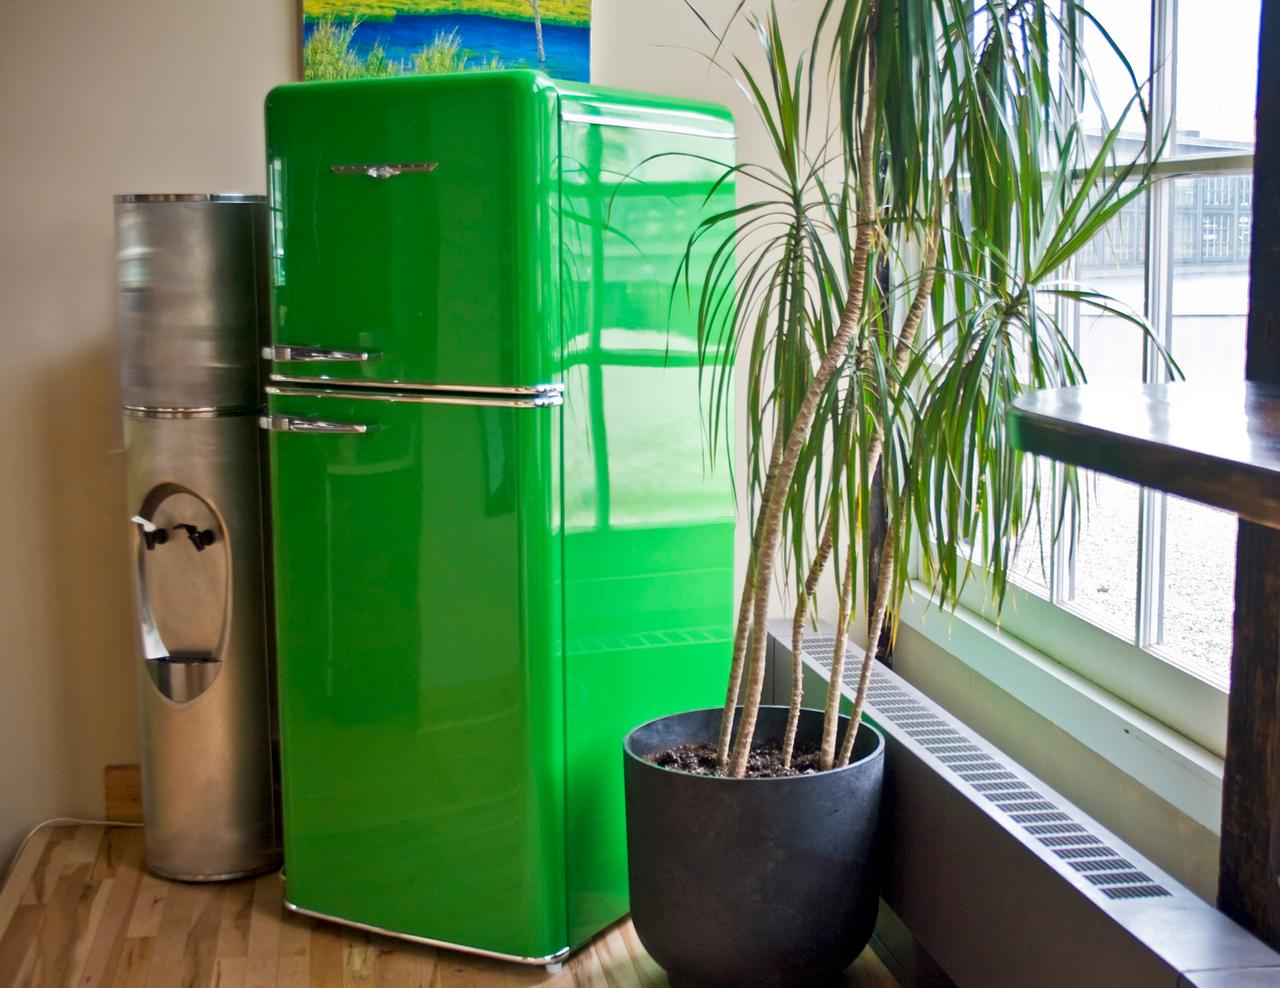 Teal Mini Fridge Home Depot: One Day. SMEG Refrigerator